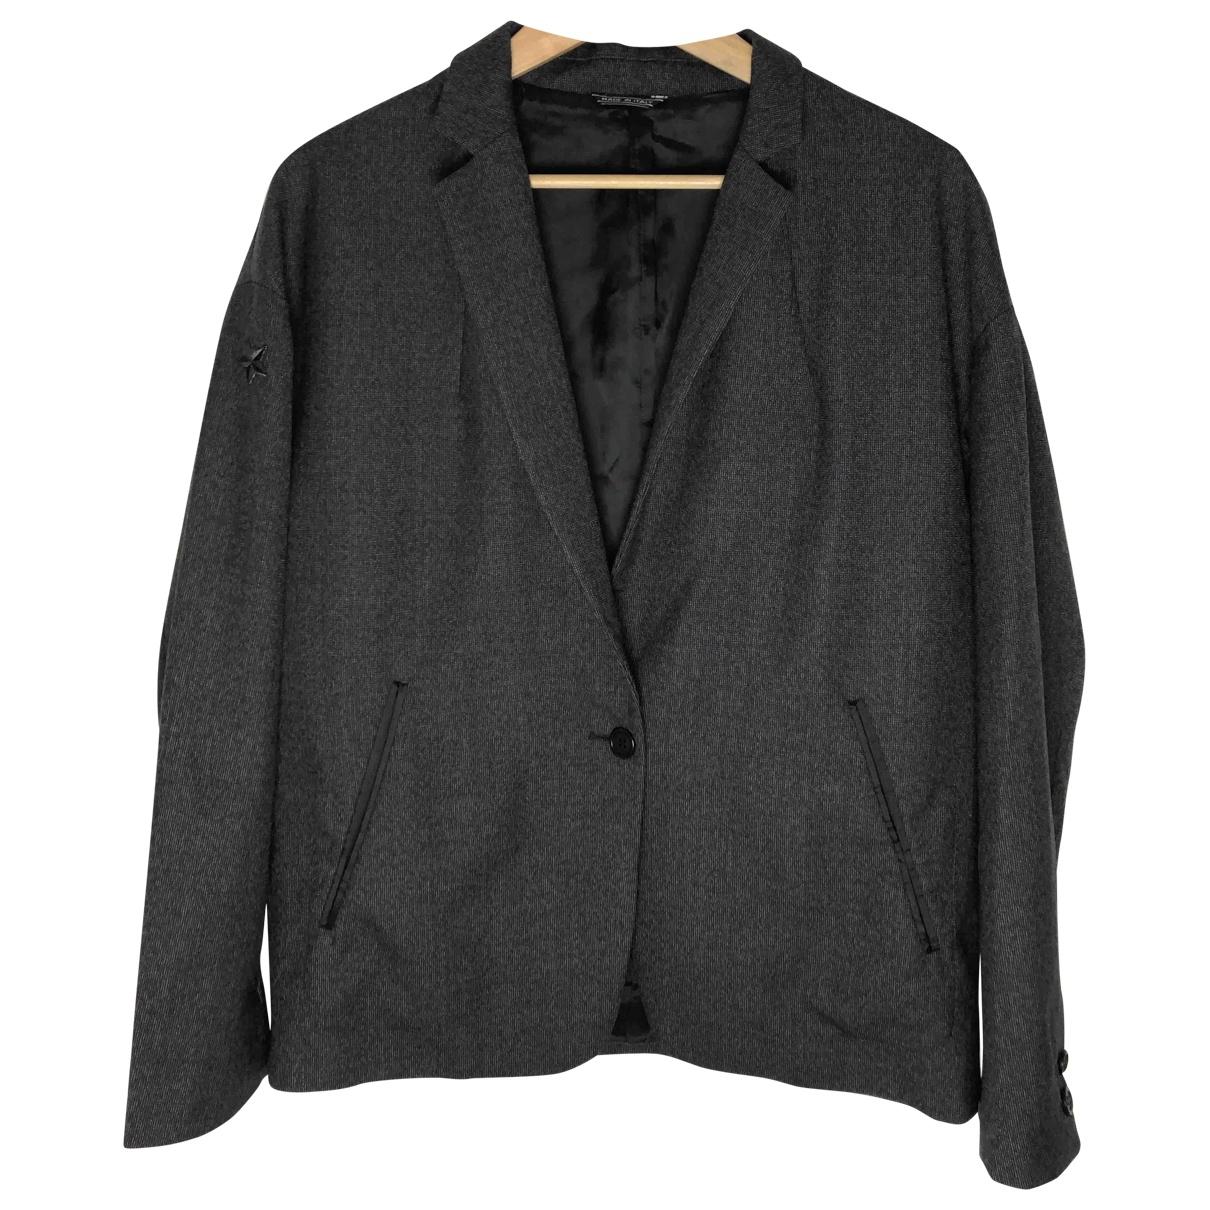 Acne Studios \N Grey Wool jacket for Women 38 FR